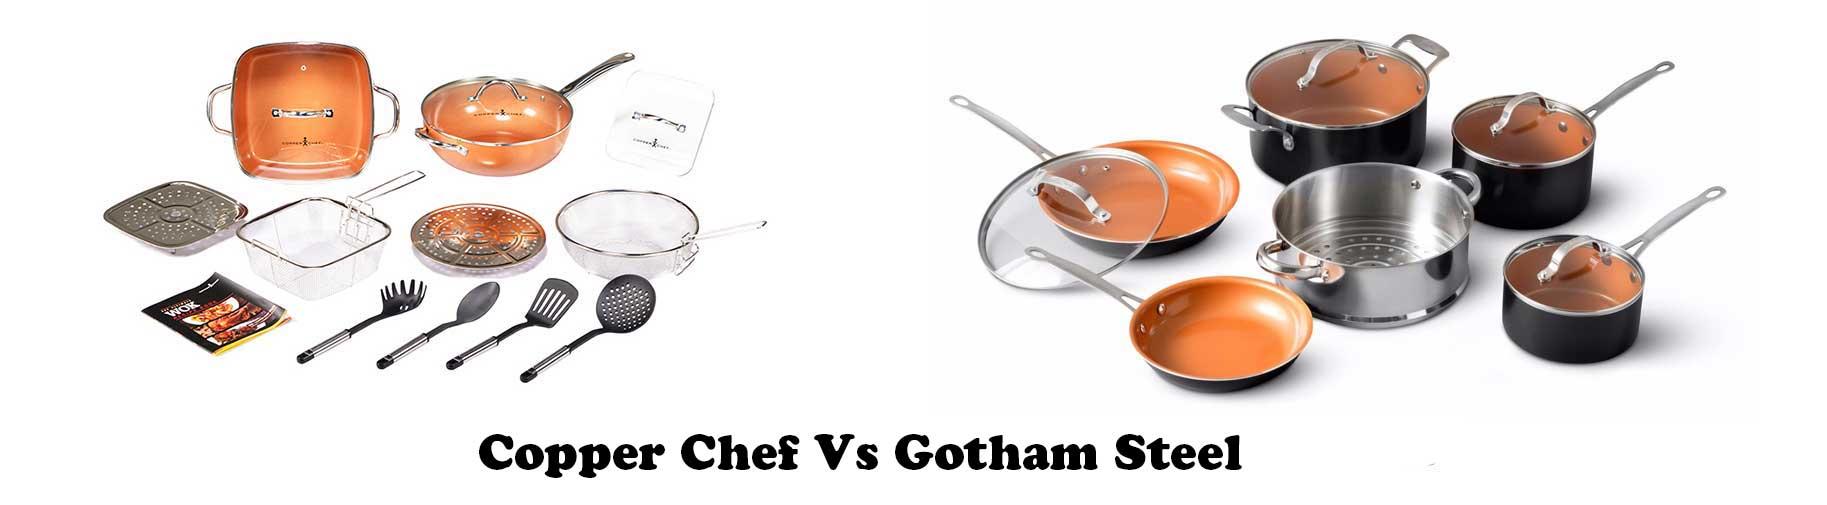 Gotham Steel Vs Copper Chef